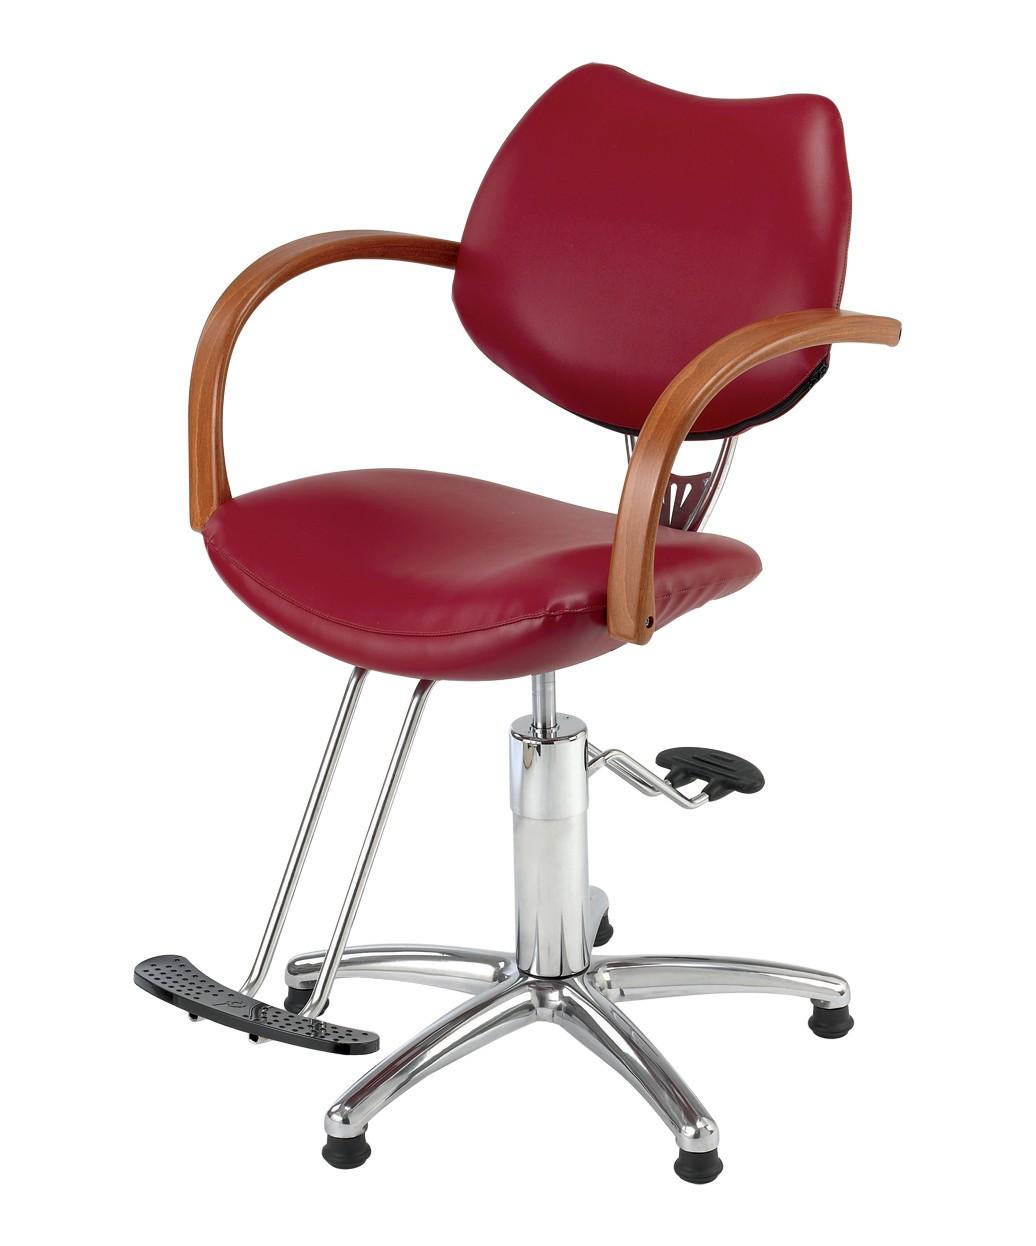 Pibbs 6606 Diva Styling Chair